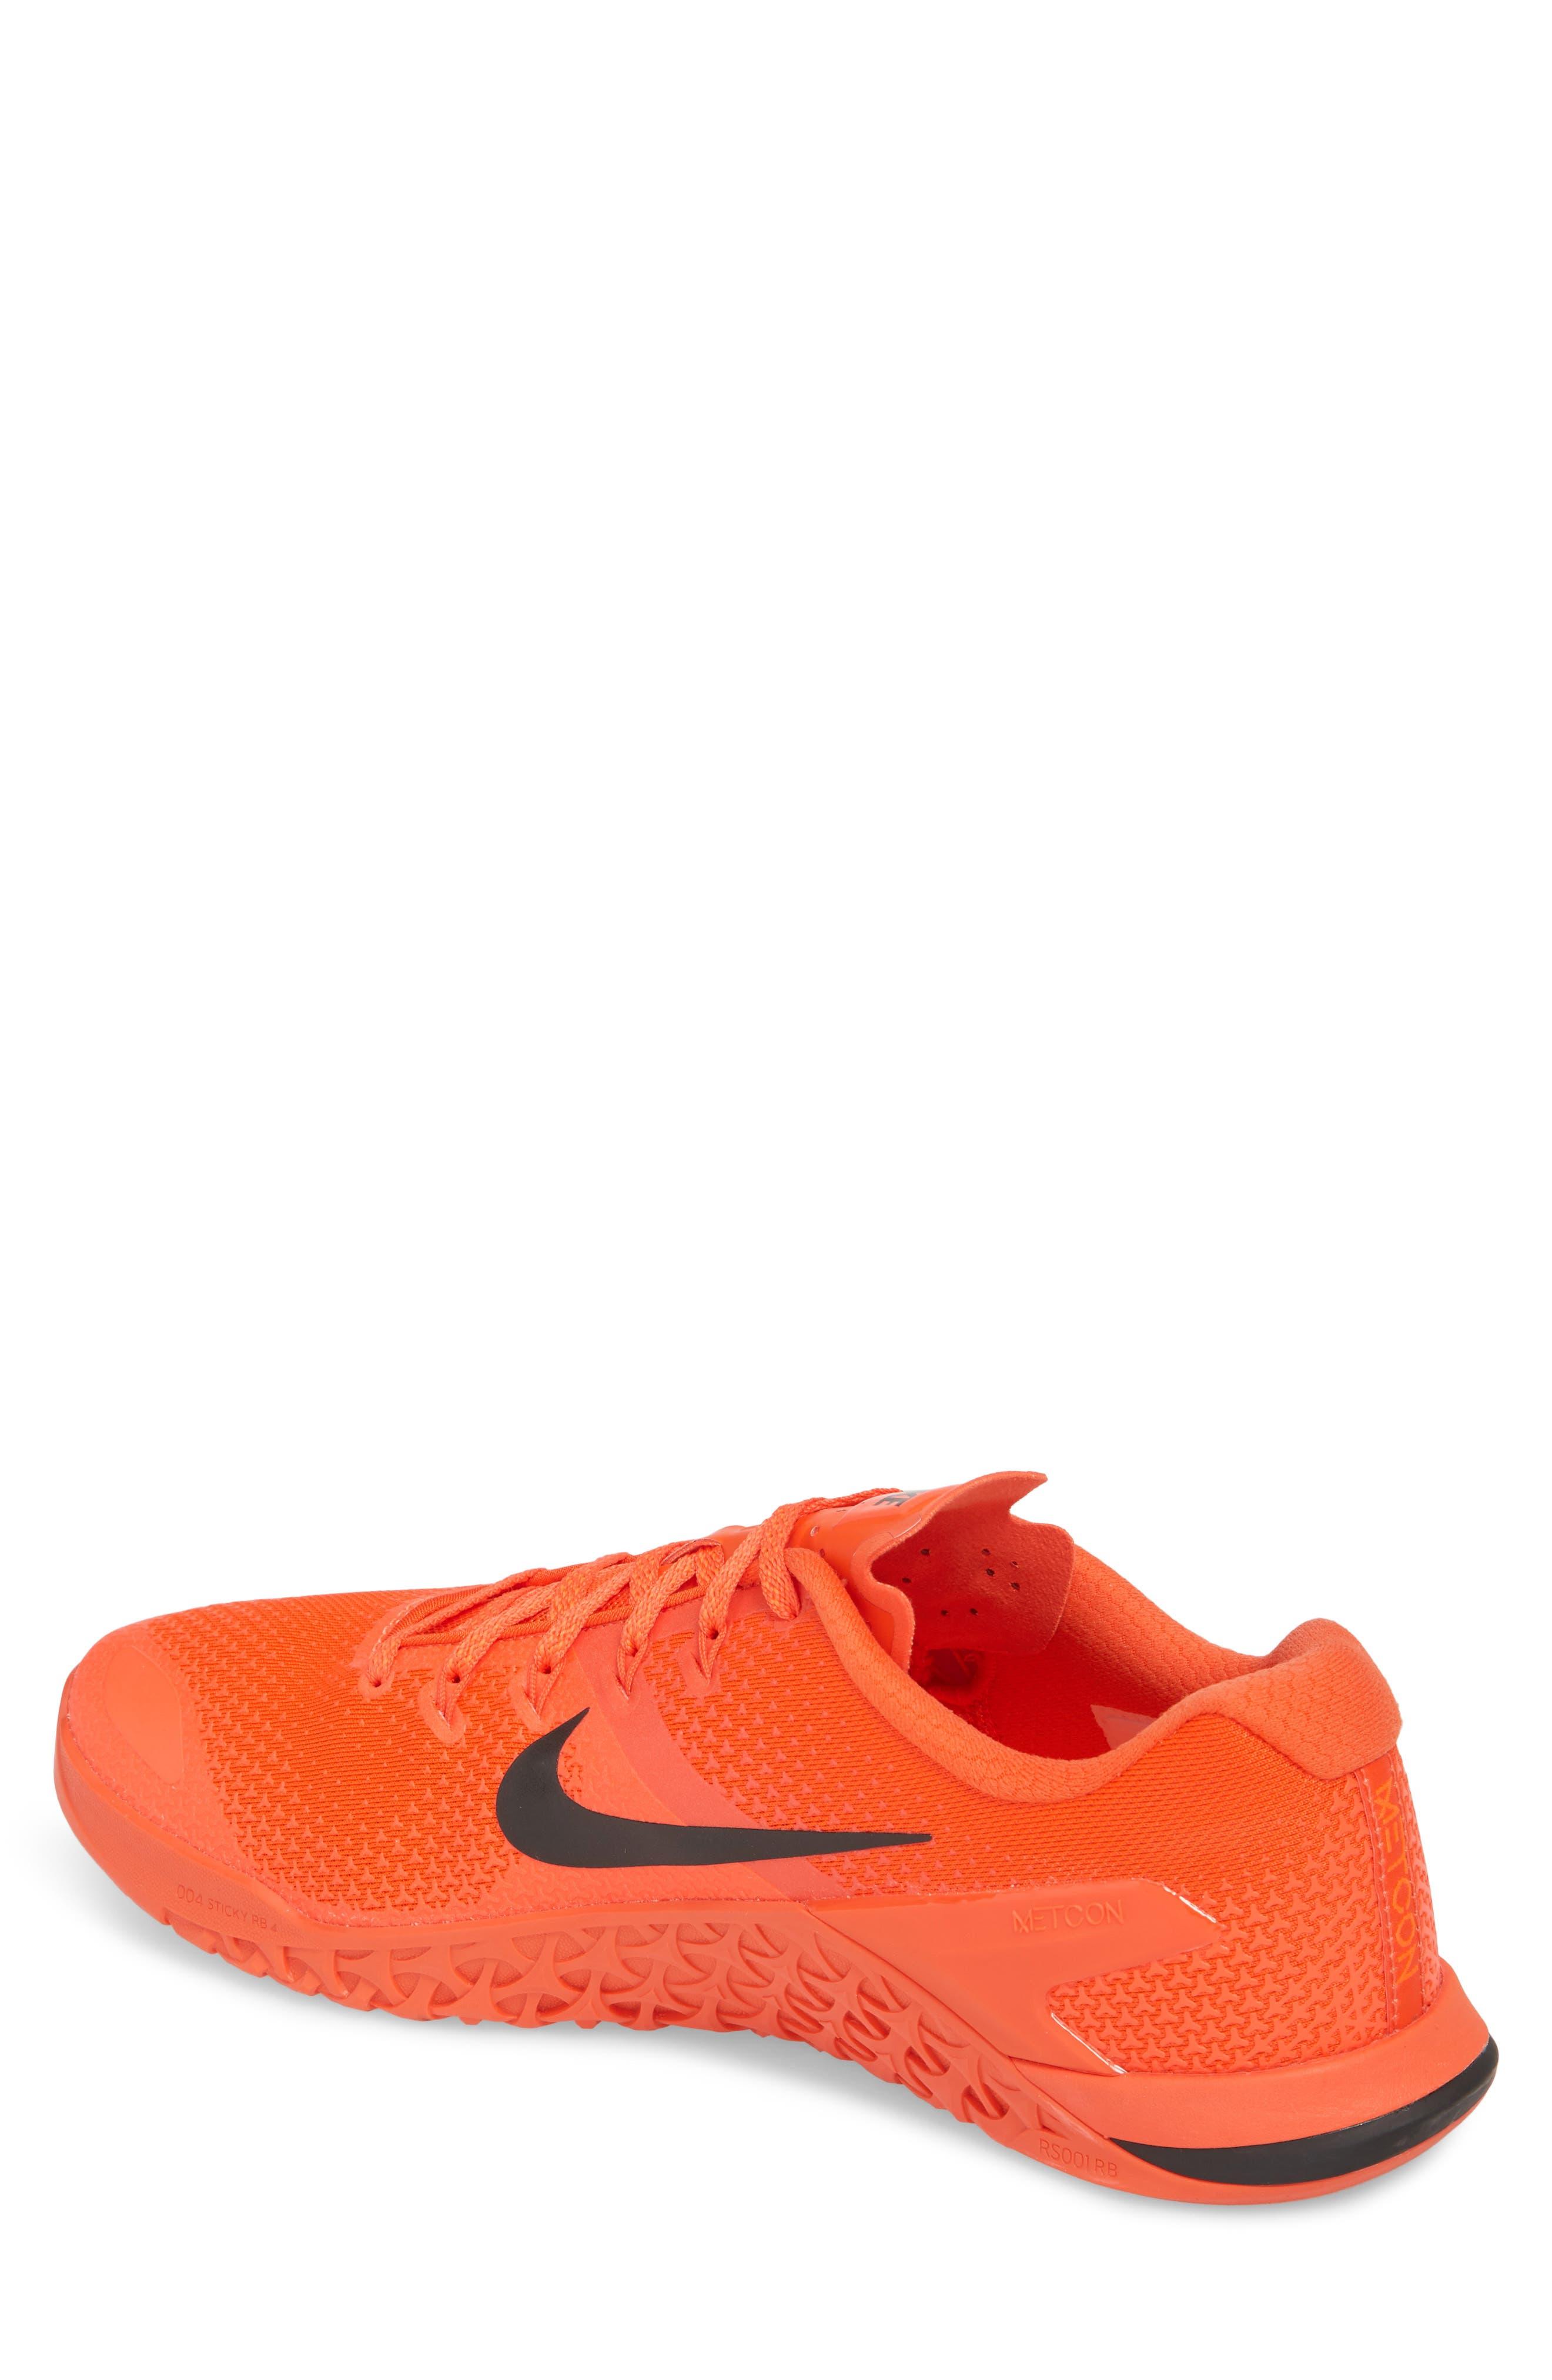 Metcon 4 Training Shoe,                             Alternate thumbnail 36, color,